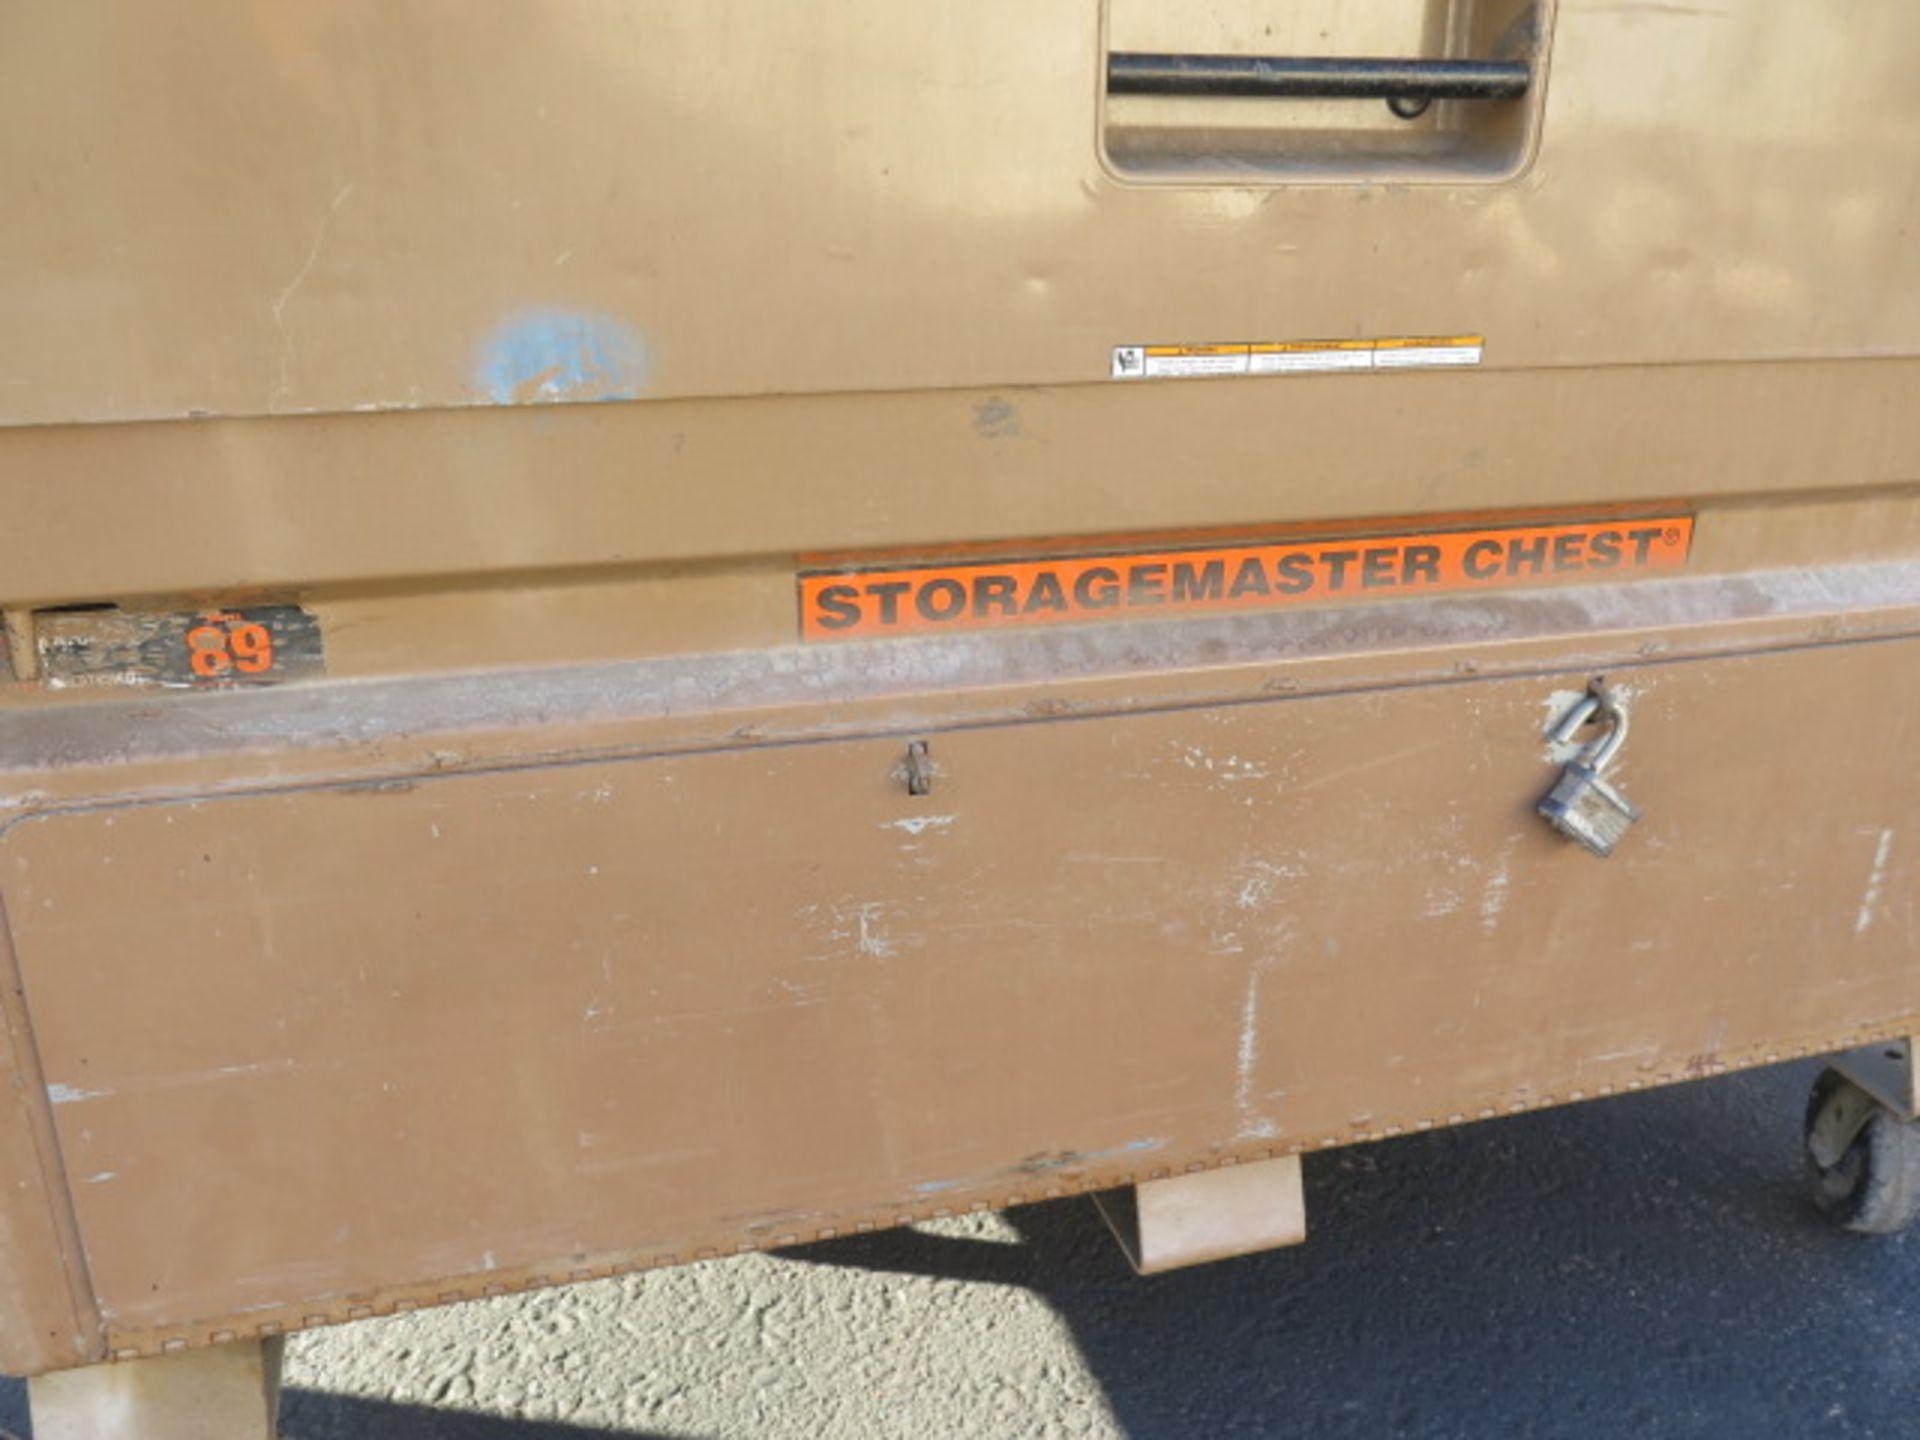 Knaack mdl. 89 Storagemaster Rolling Job Box (SOLD AS-IS - NO WARRANTY) - Image 3 of 12